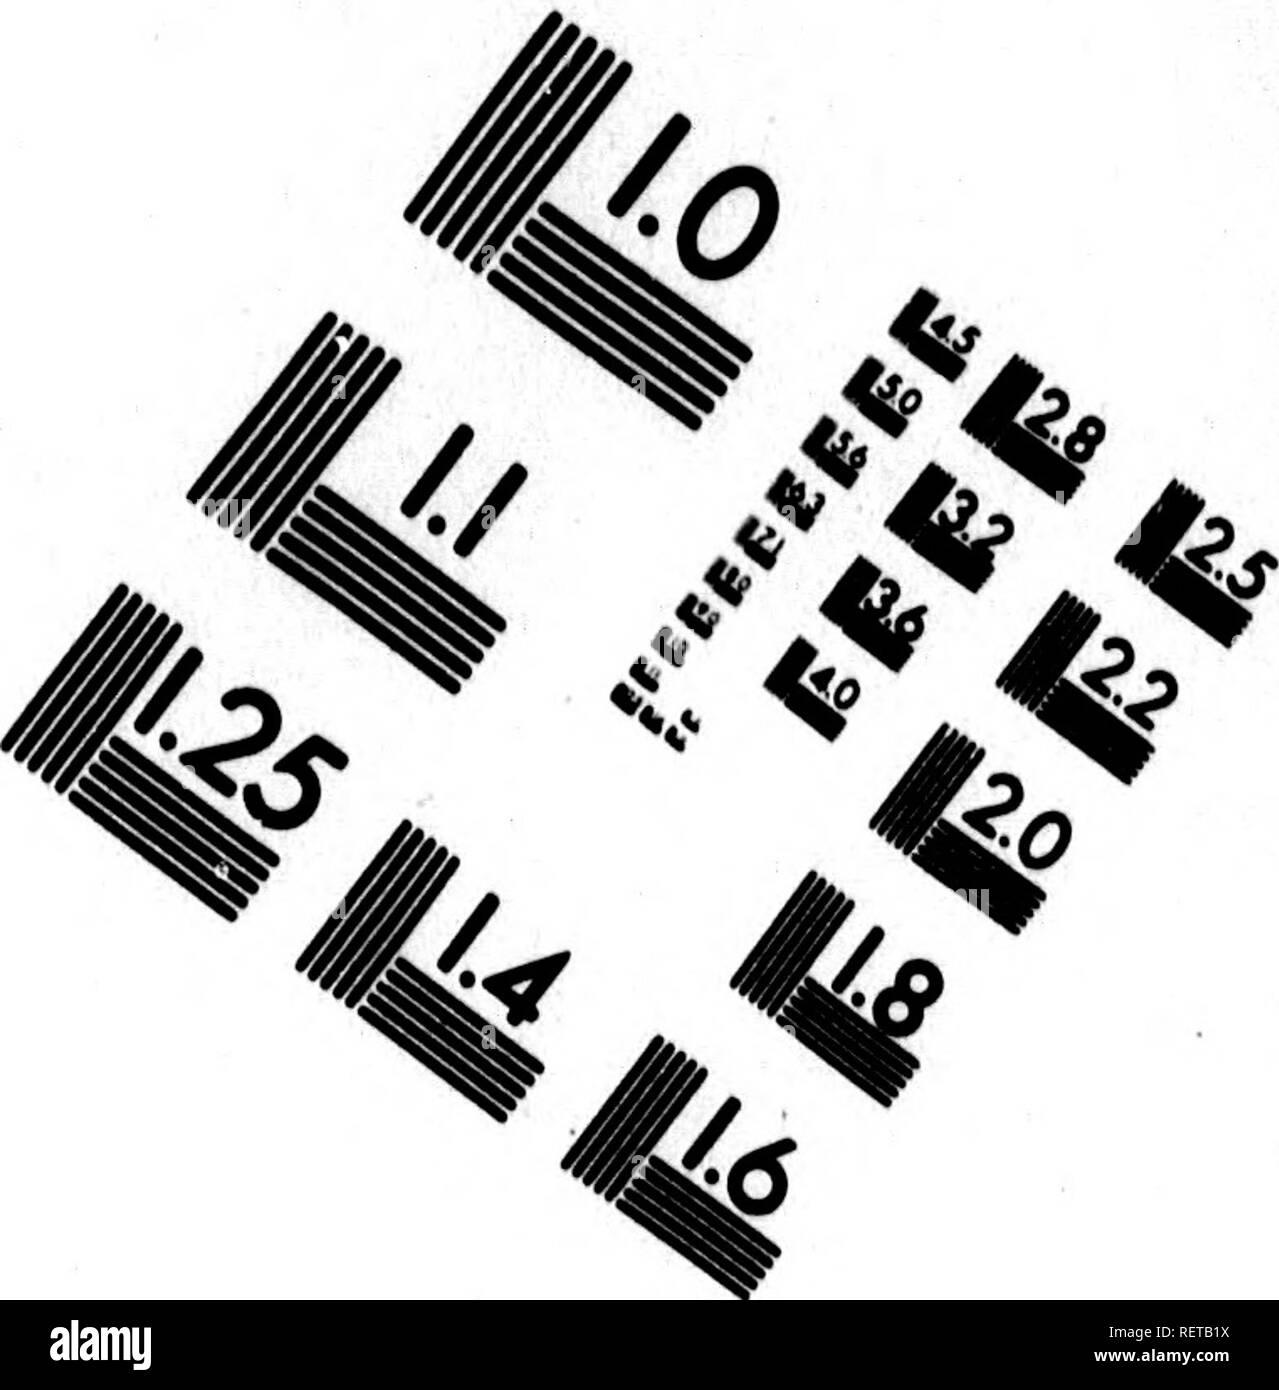 . Histoire naturelle, générale et particulière [microforme] : servant de suite à l'histoire des animaux quadrupèdes. Sciences naturelles; Natural history. (MAGE EVALUATION TEST TARGET (MT-3). 1.0 l.l 11.25 UÃ|28 |25 â 2.2 Mil. Please note that these images are extracted from scanned page images that may have been digitally enhanced for readability - coloration and appearance of these illustrations may not perfectly resemble the original work.. Buffon, Georges Louis Leclerc, comte de, 1707-1788. A Paris : De l'Imprimerie royale - Stock Image